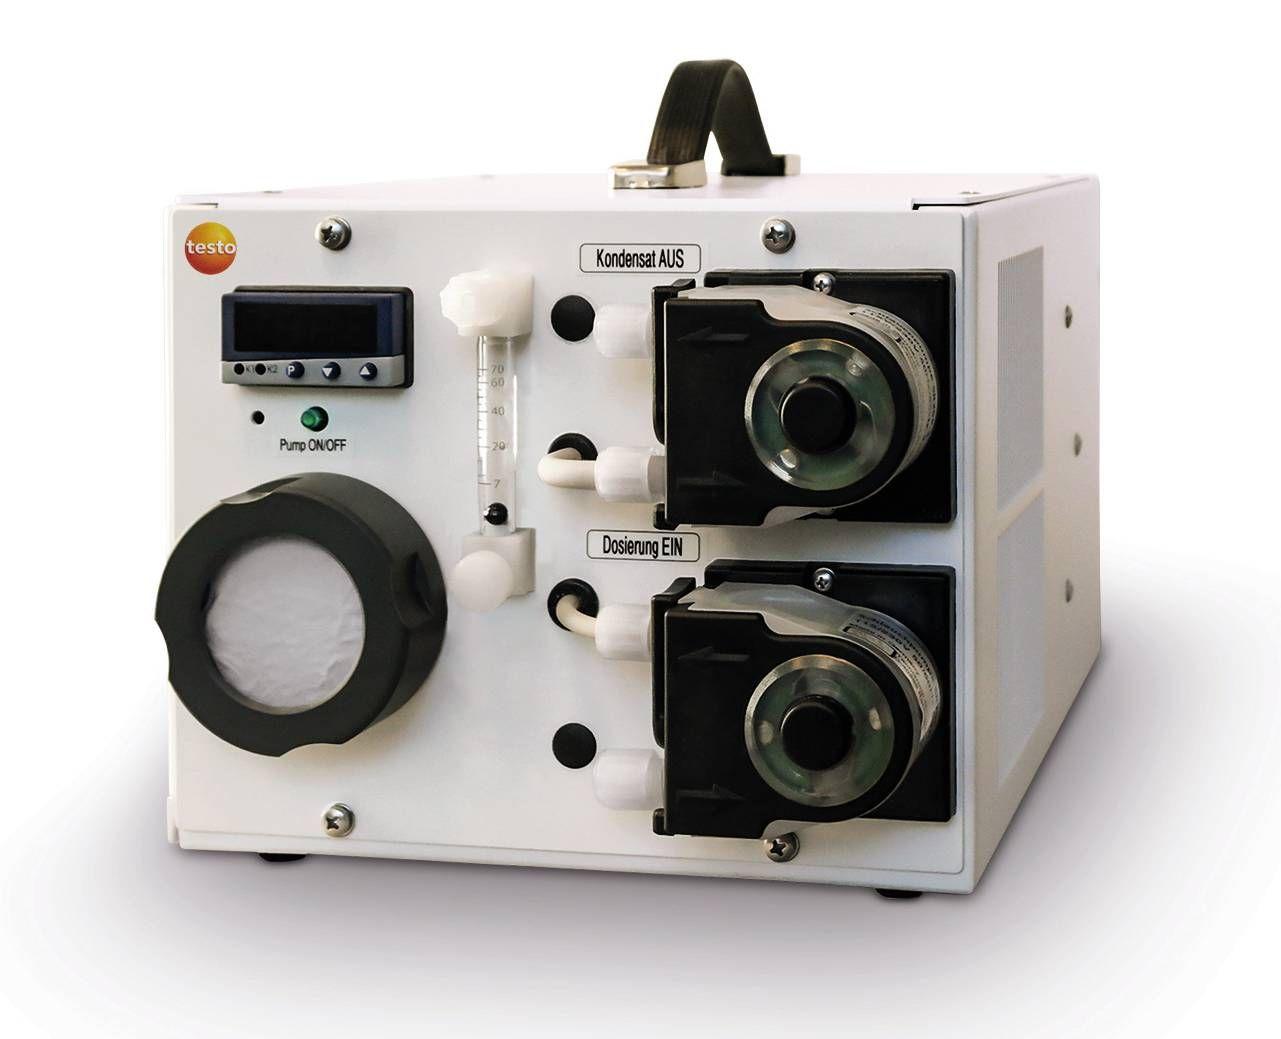 testo 3007高功率低損失煙氣預處理採樣系統